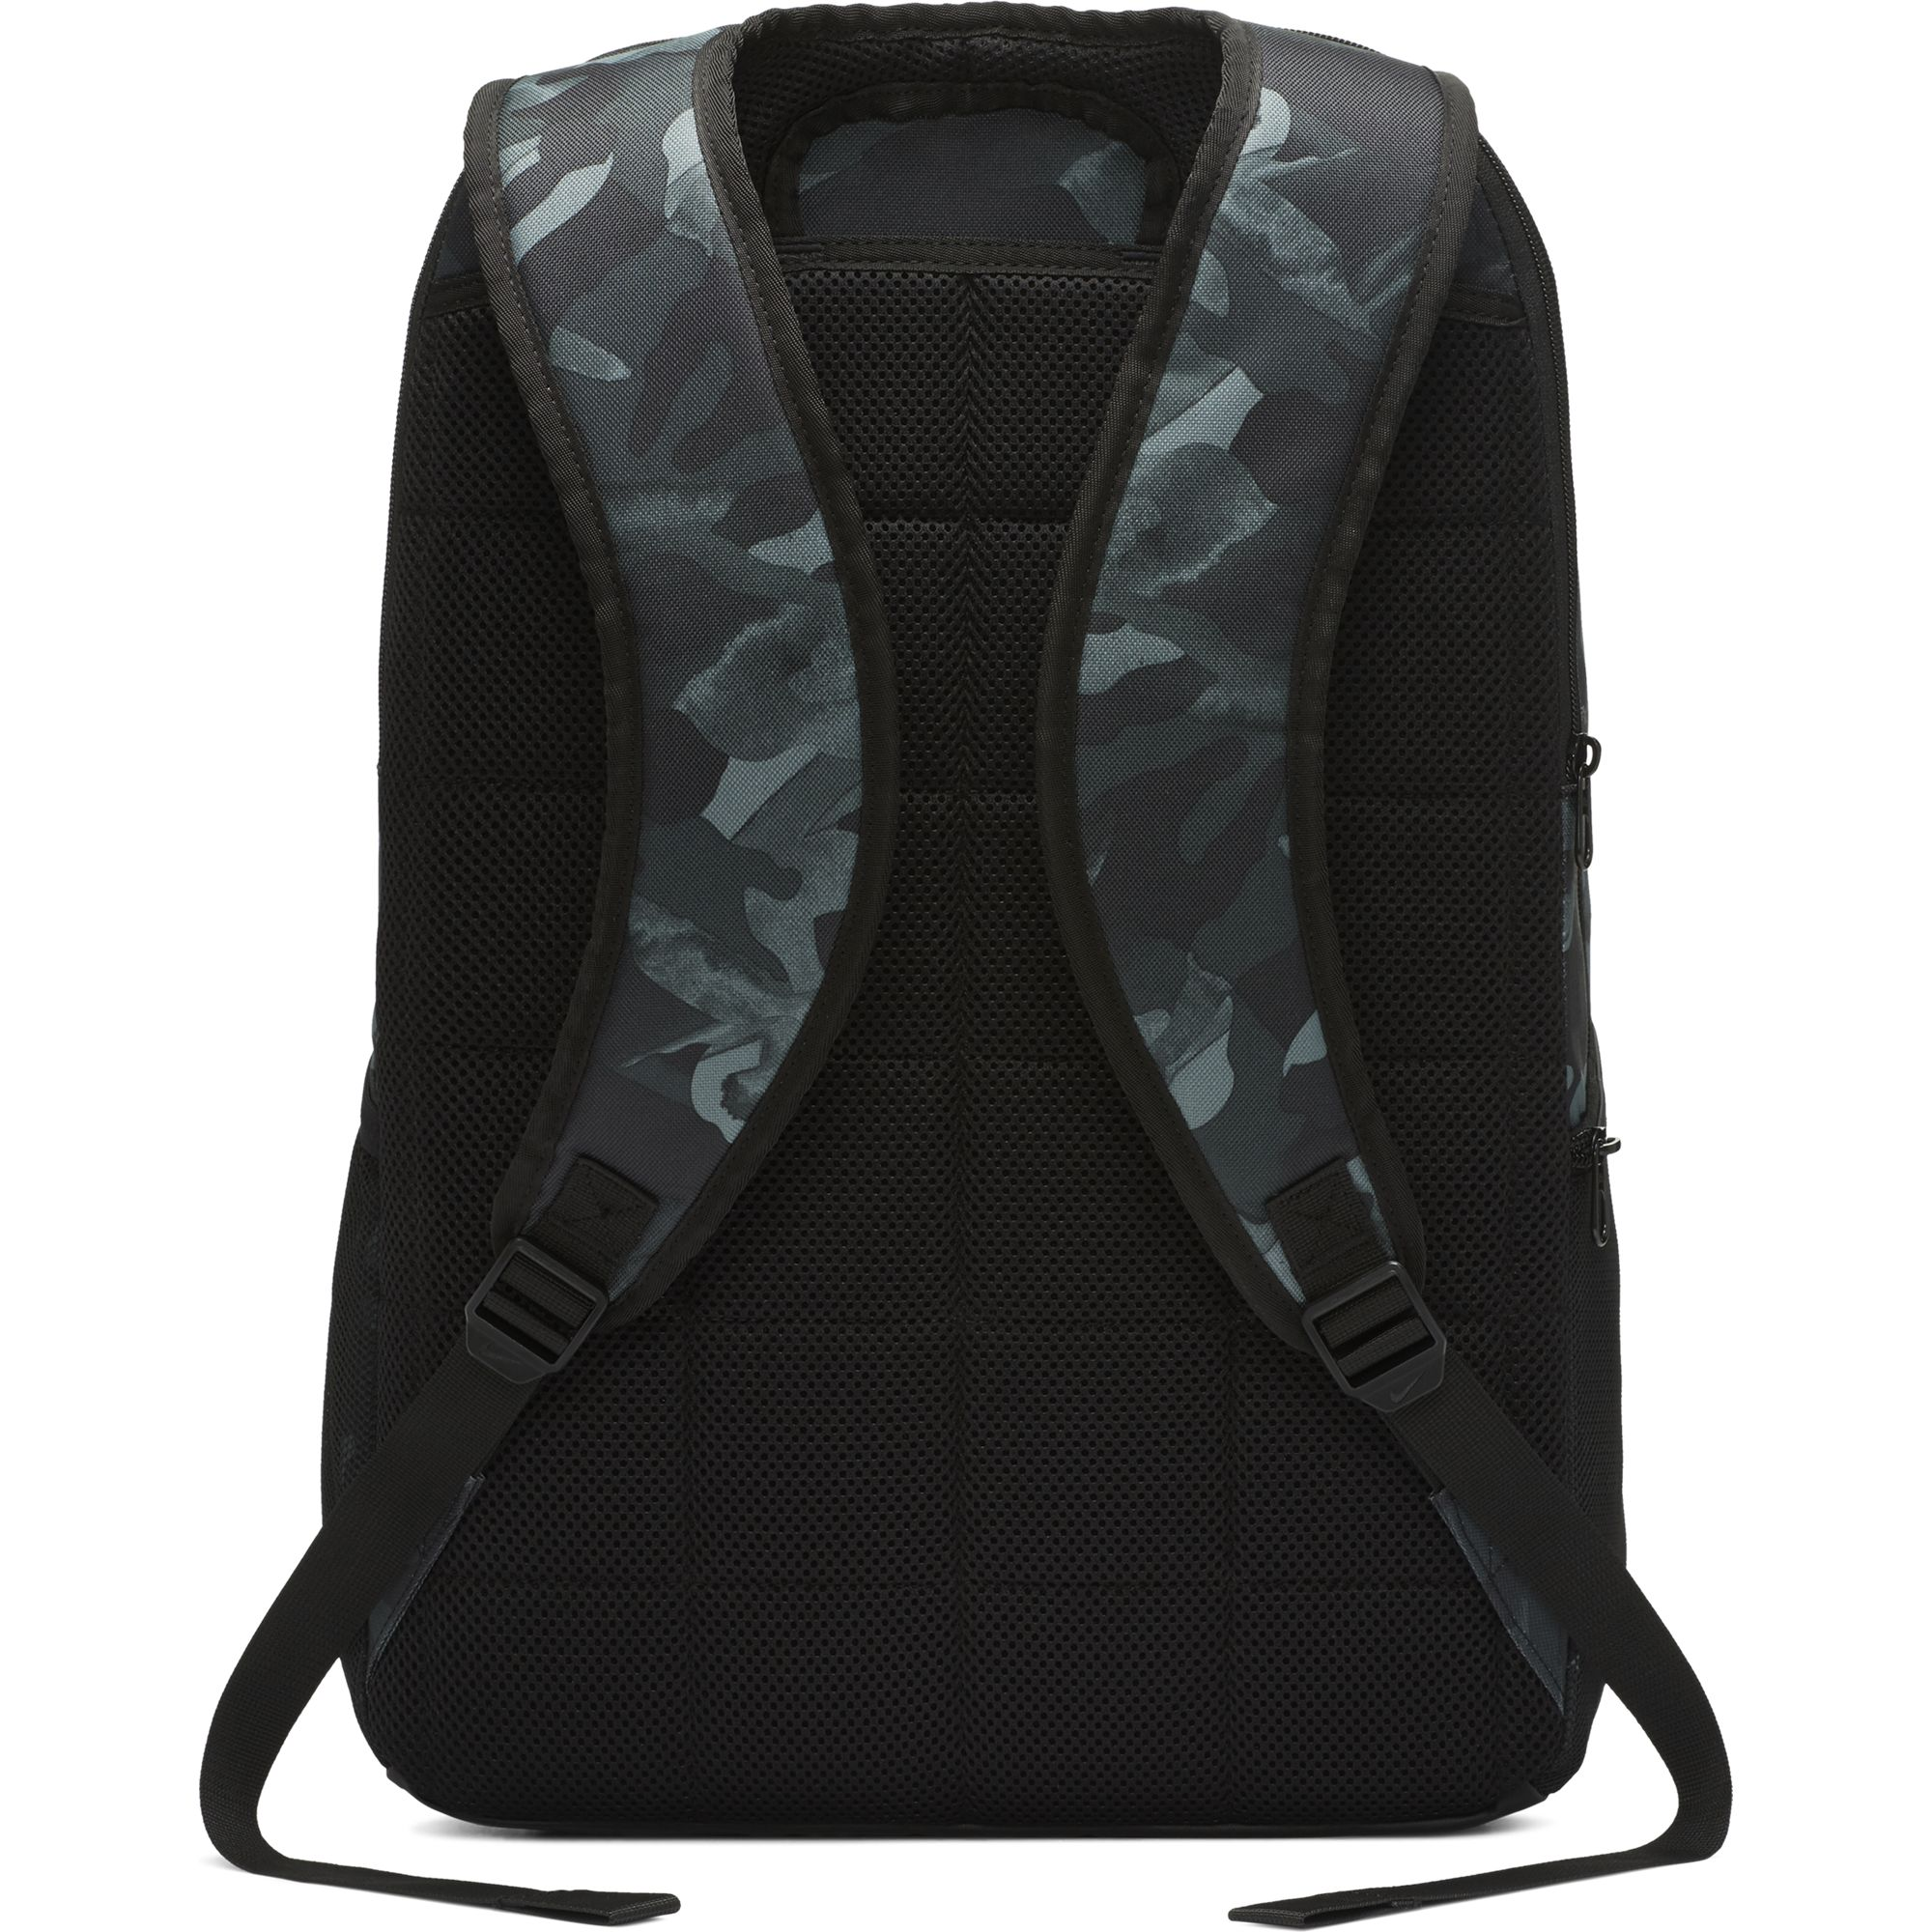 Brasilia XL Backpack, Gray/Woodbark Camo, swatch